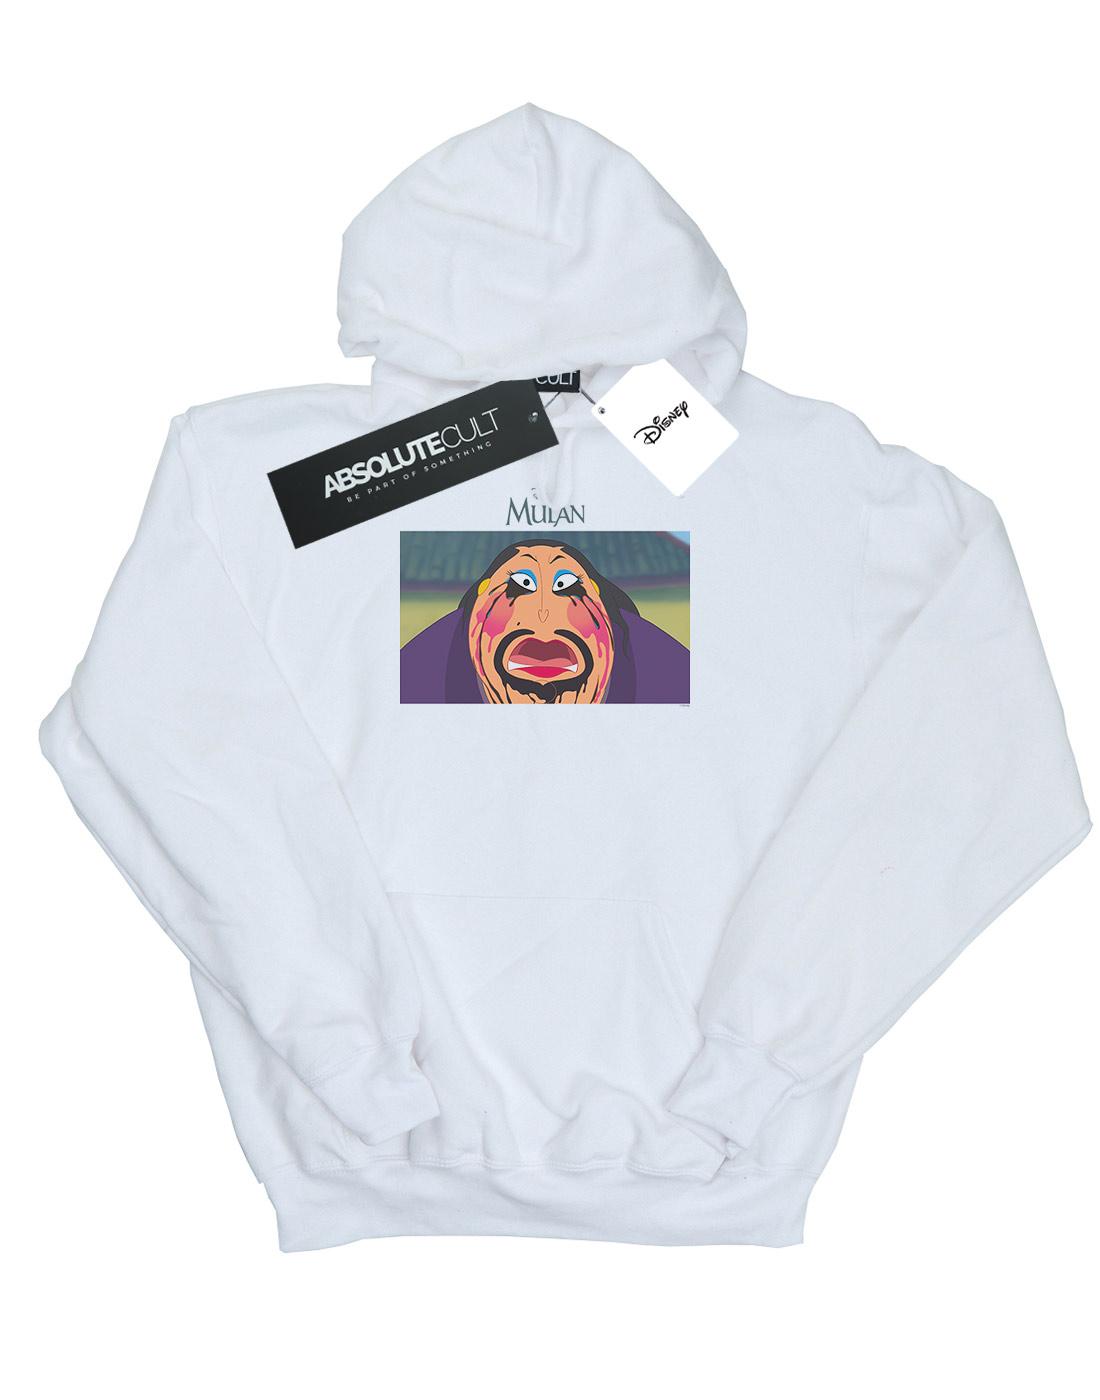 Disney Men/'s Mulan The Matchmaker Sweatshirt